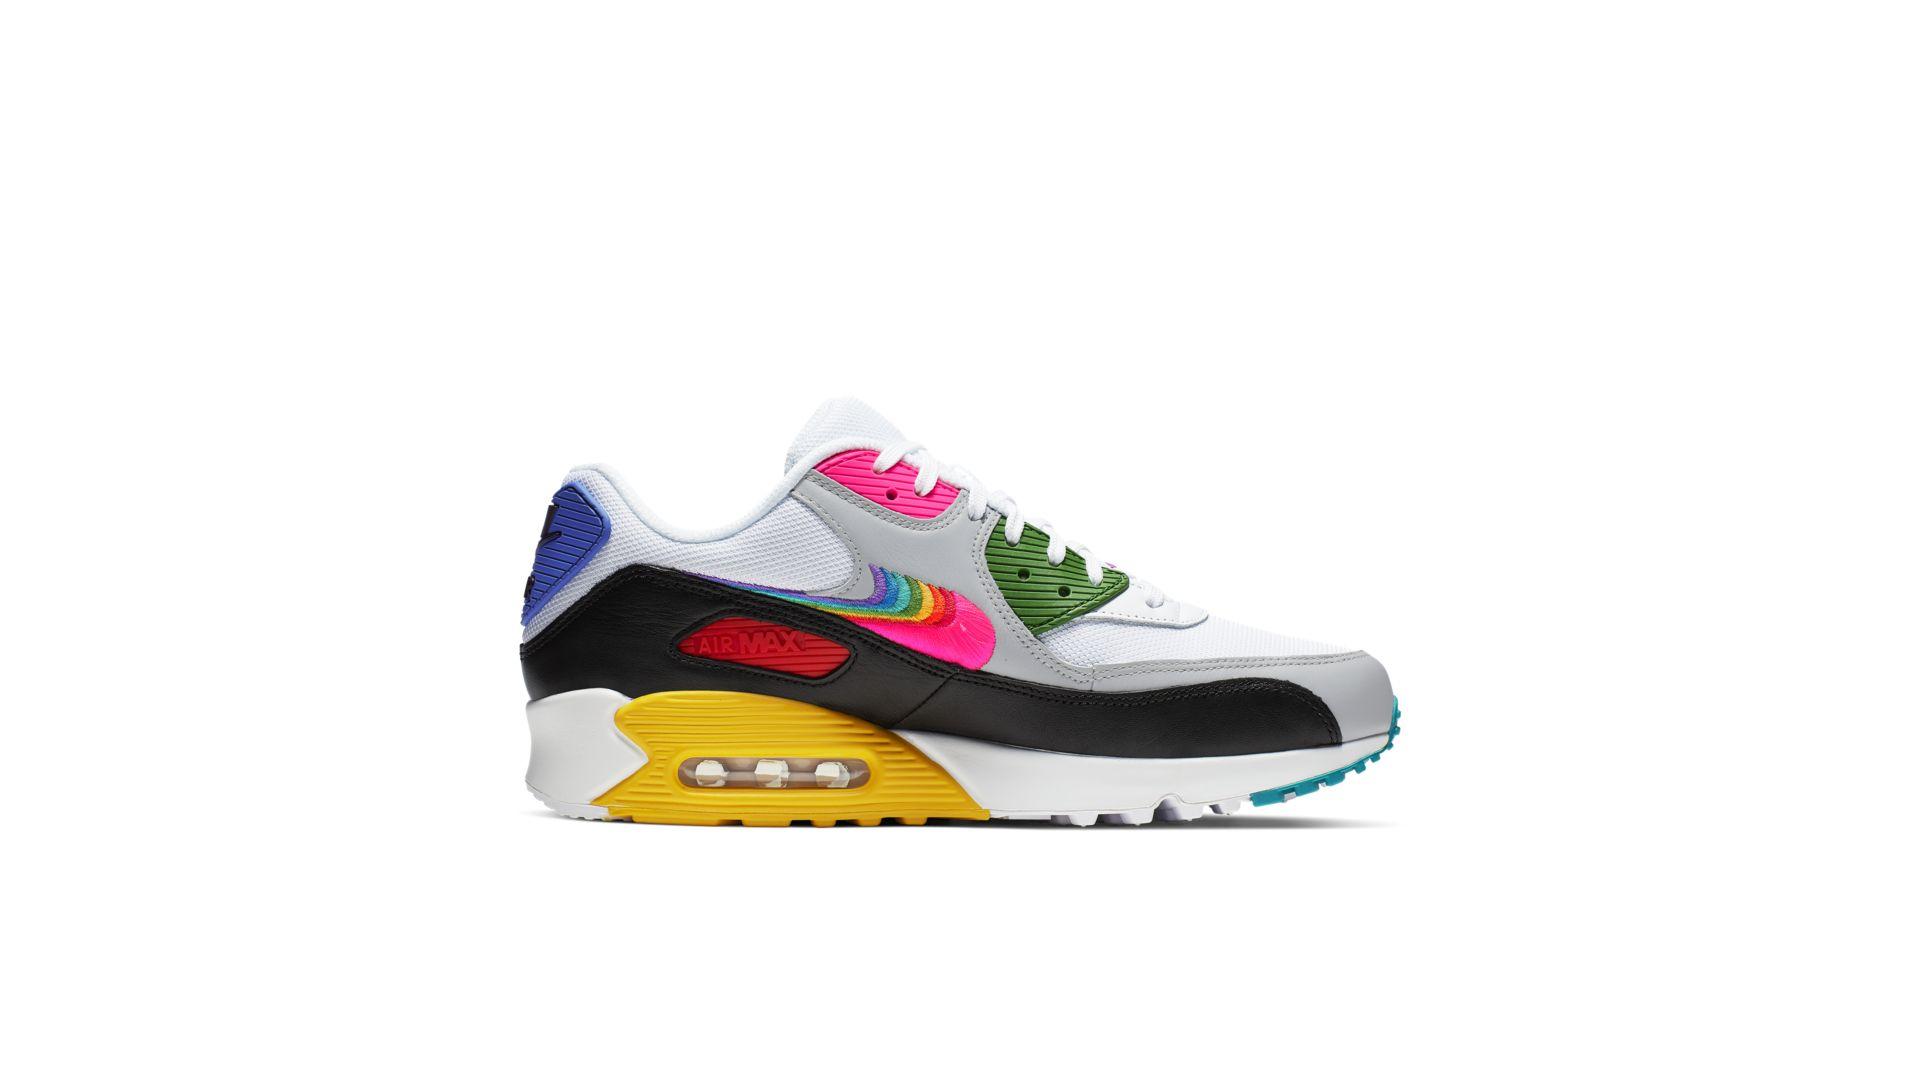 Nike Air Max 90 Be True (2019) (CJ5482-100)